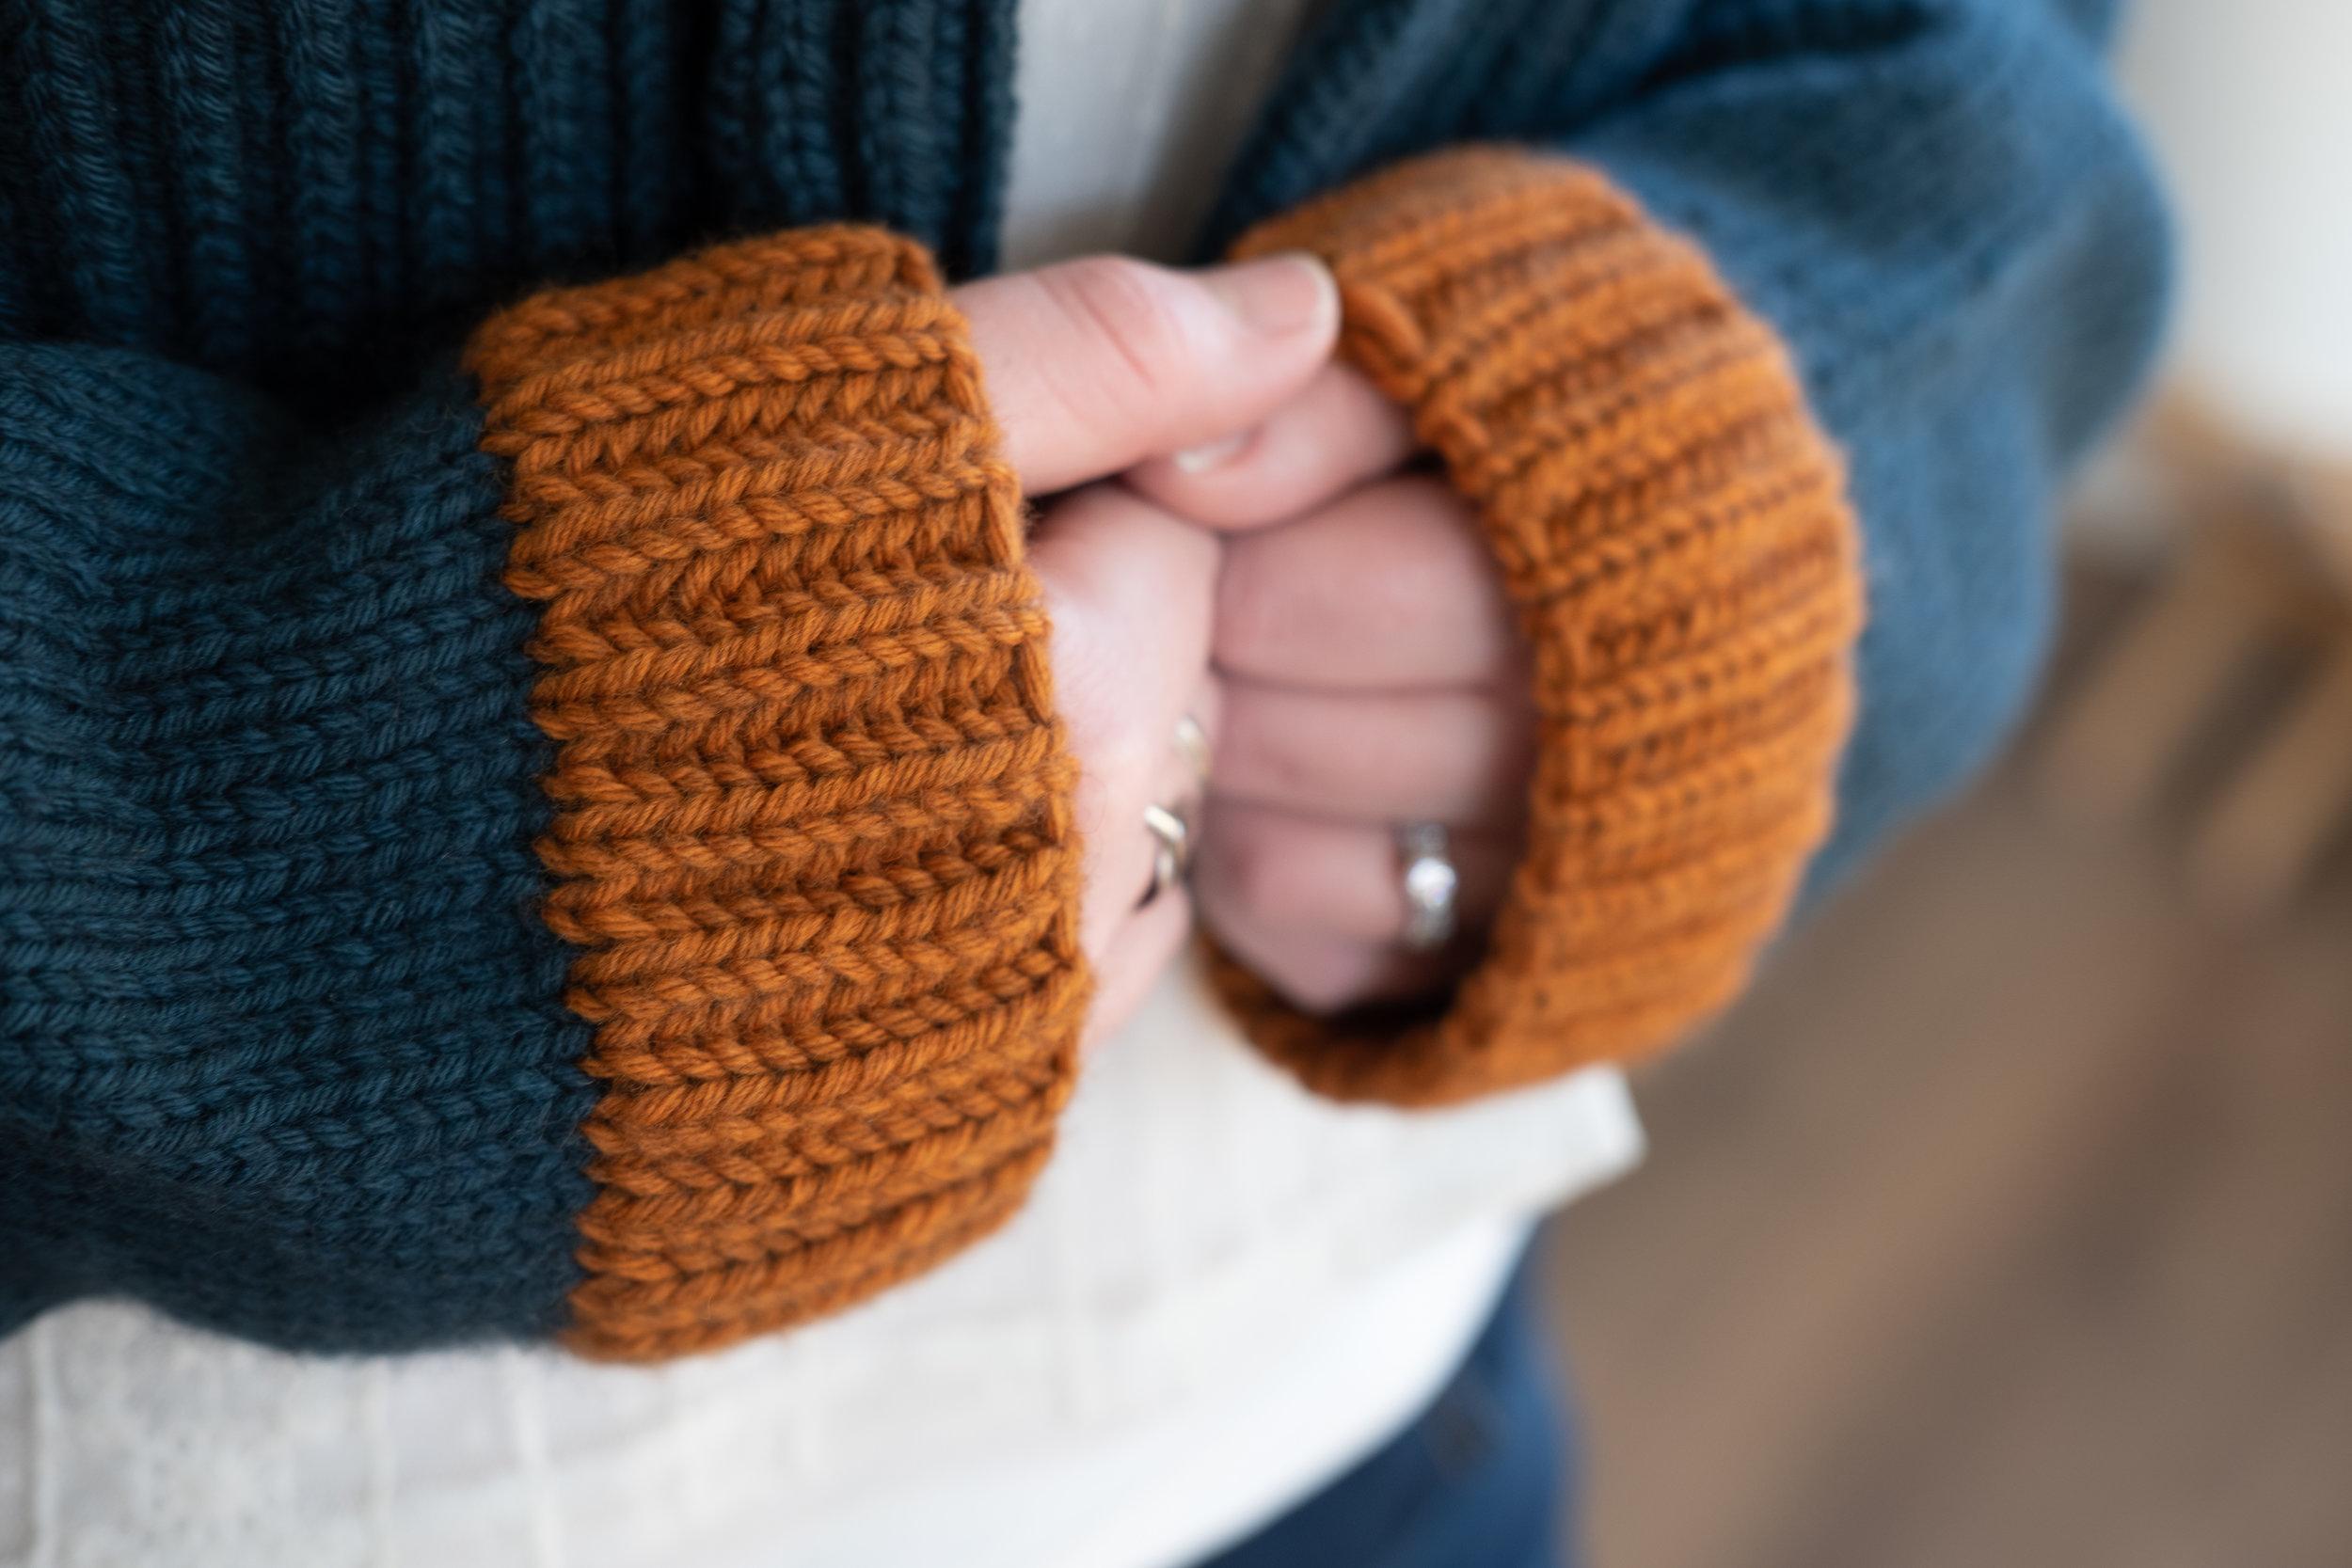 rangel_button-bay_sweater-3.jpg